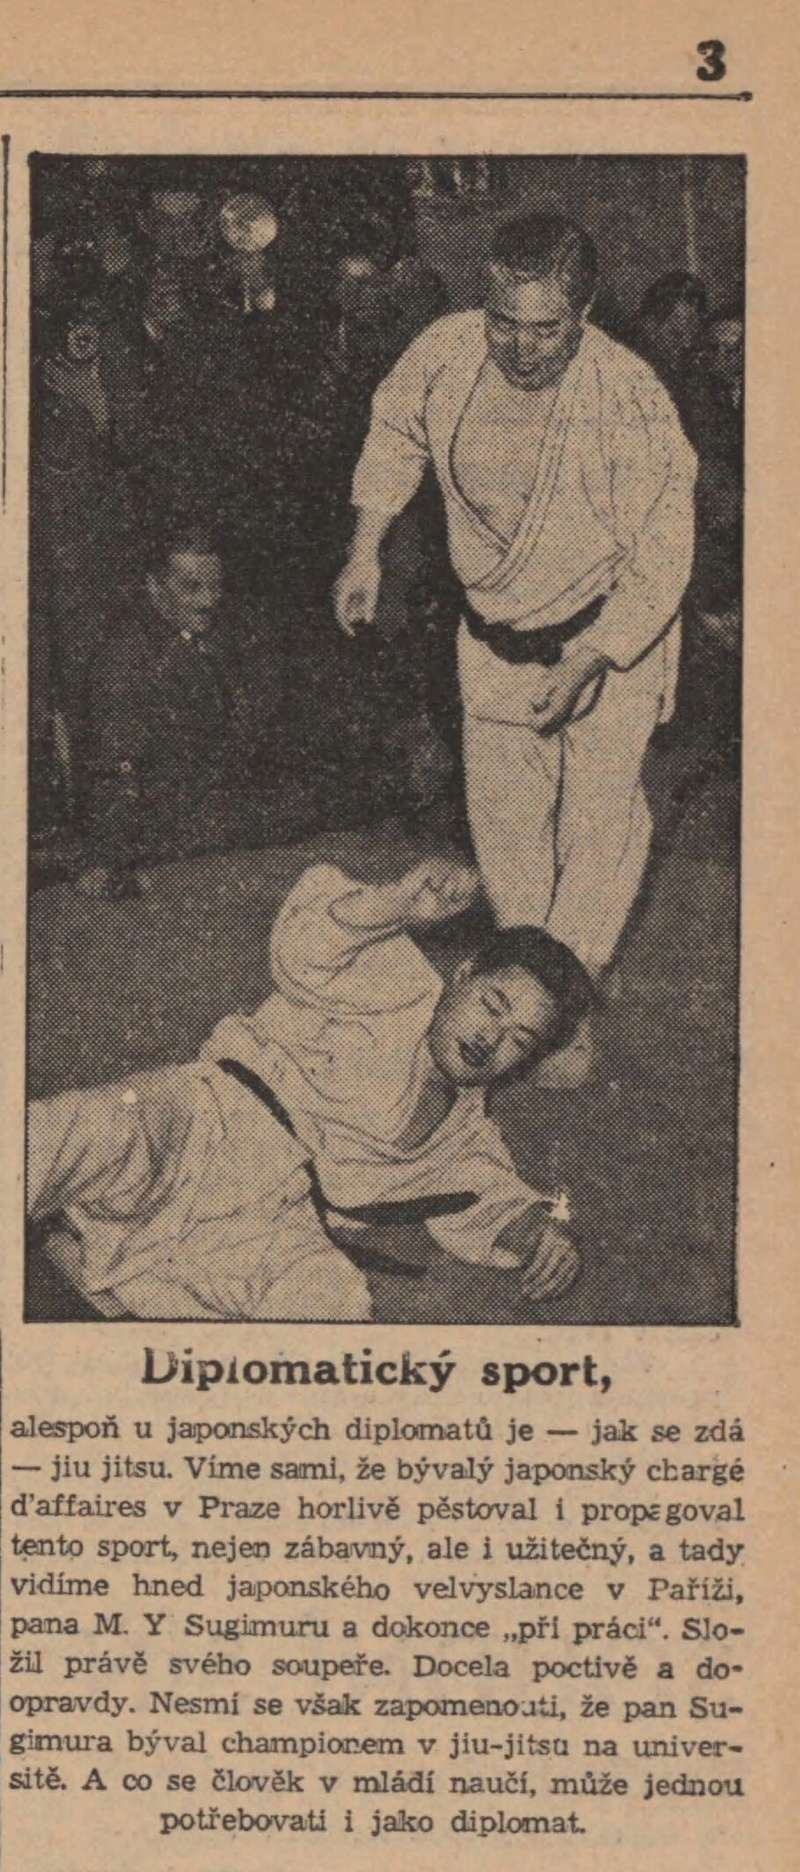 1938 - M. Y Sugimura (japanese ambasador in France) shows judo with Kawaishi in Paris 19380210